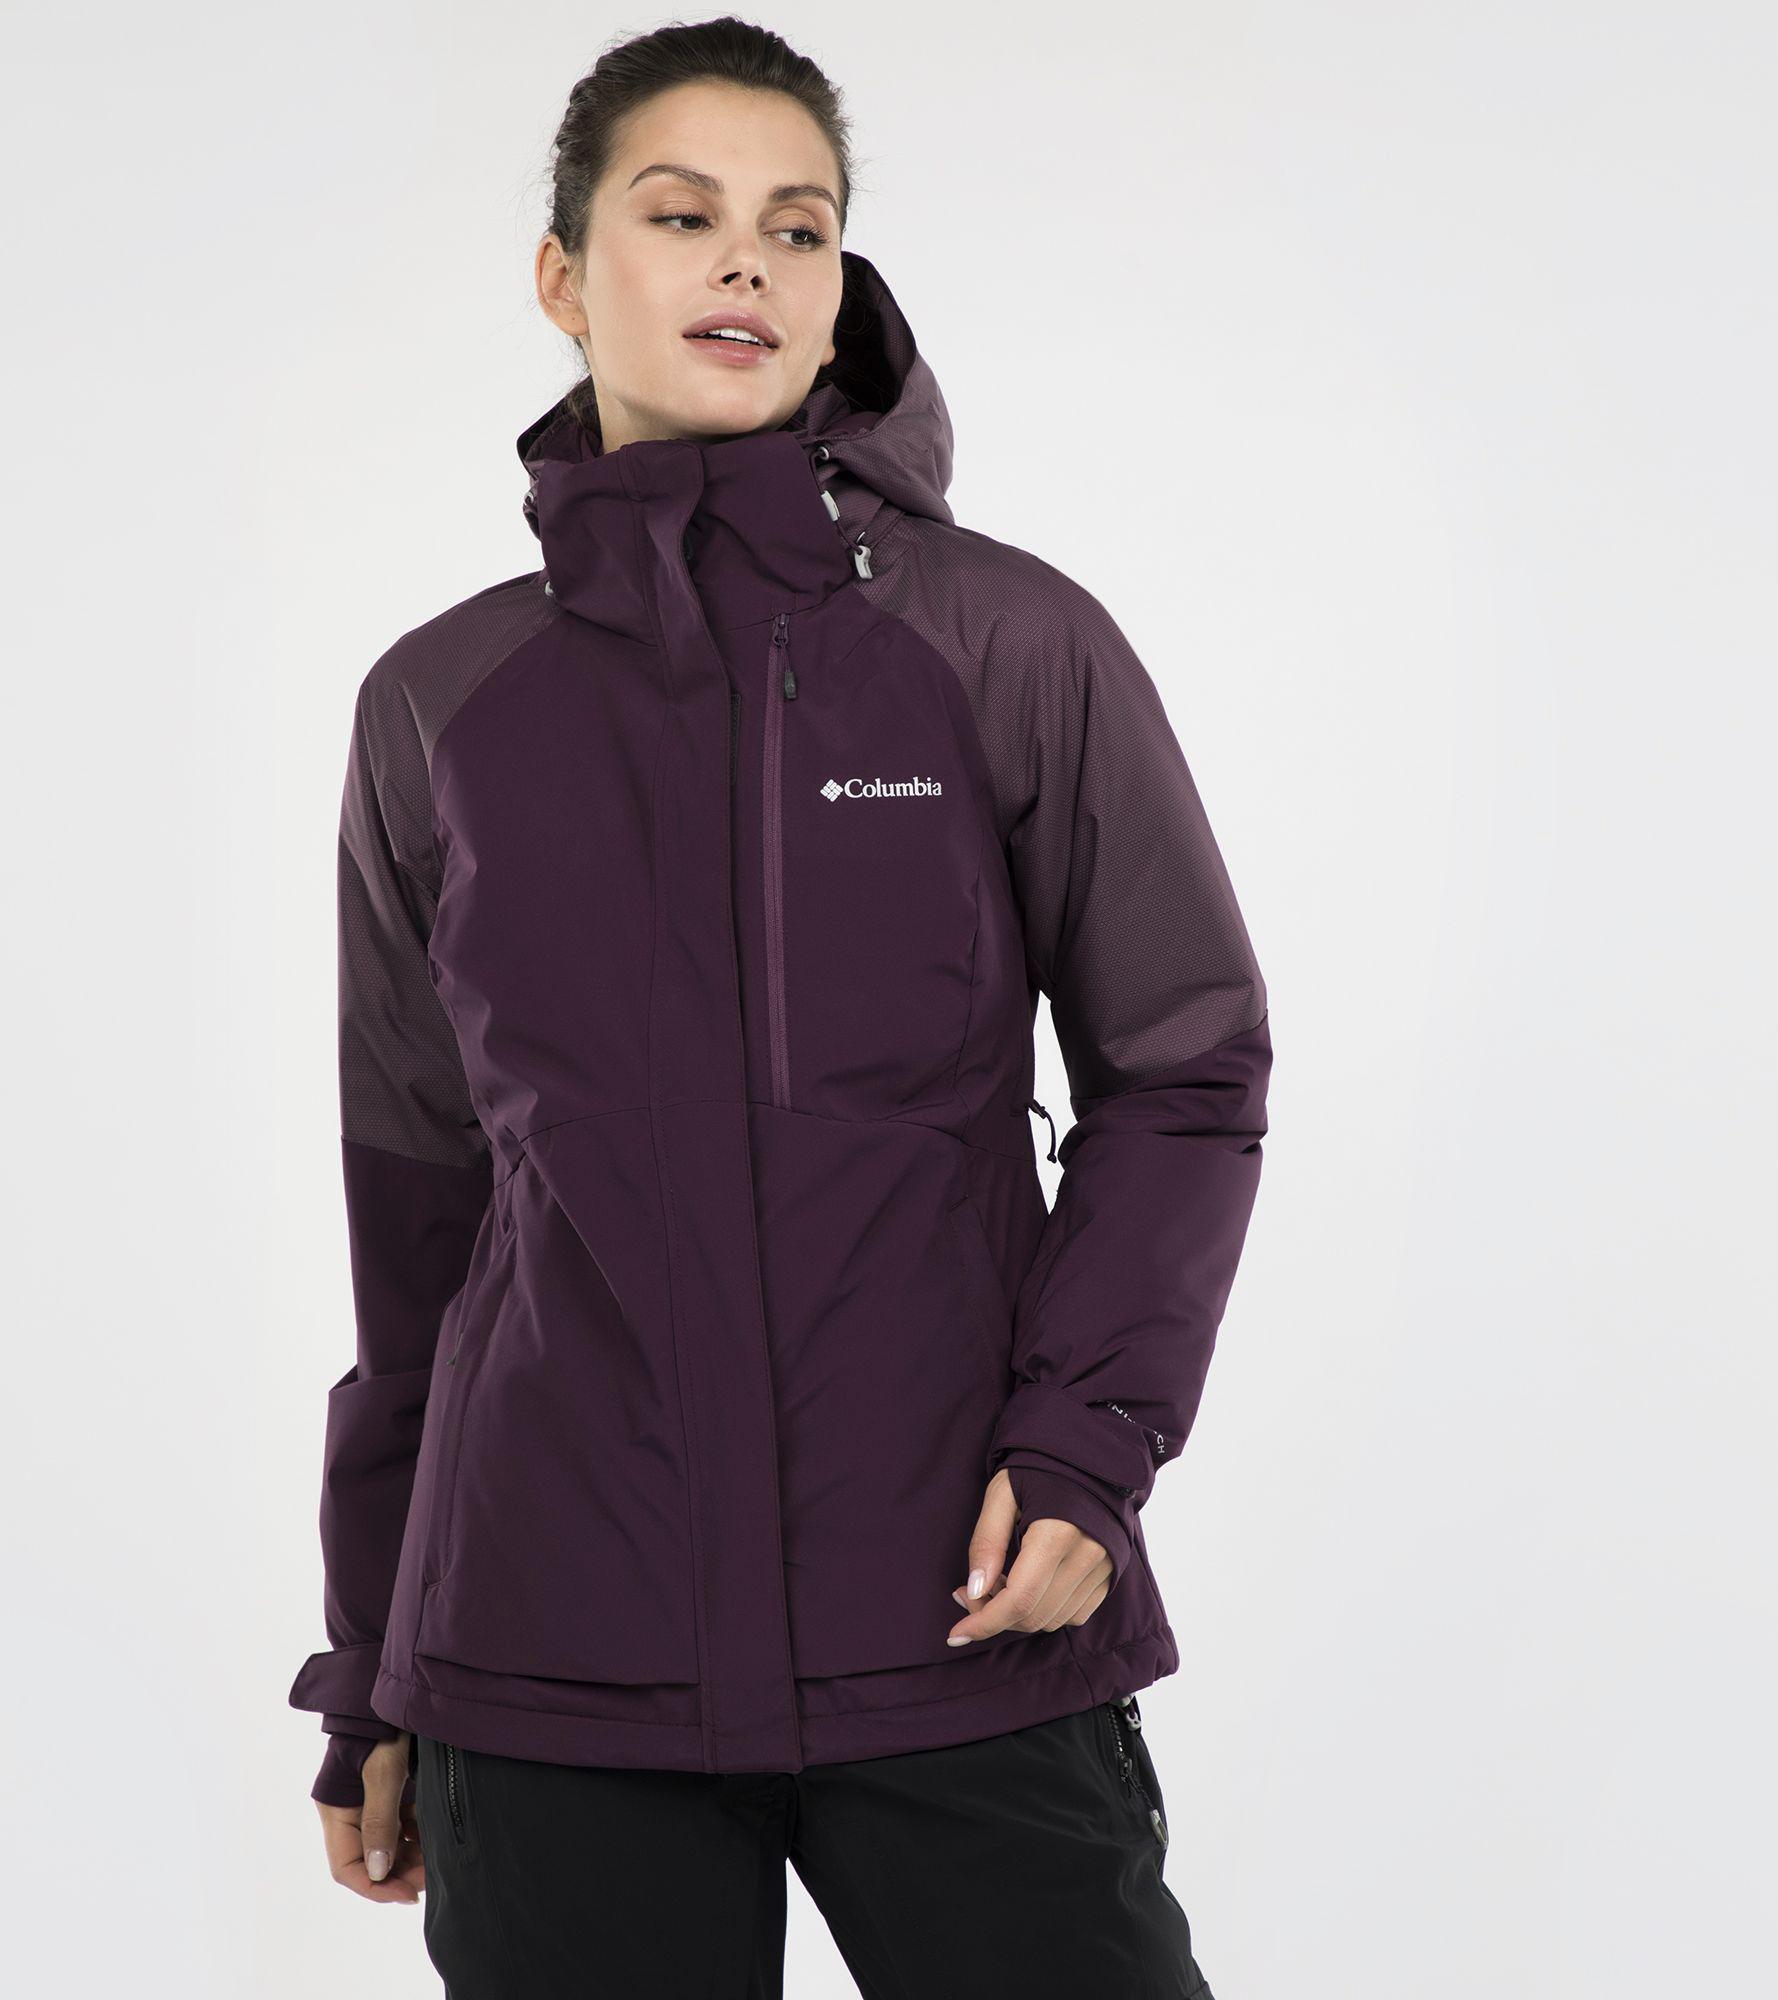 Columbia Куртка утепленная женская Columbia Wildside, размер 46 цена и фото